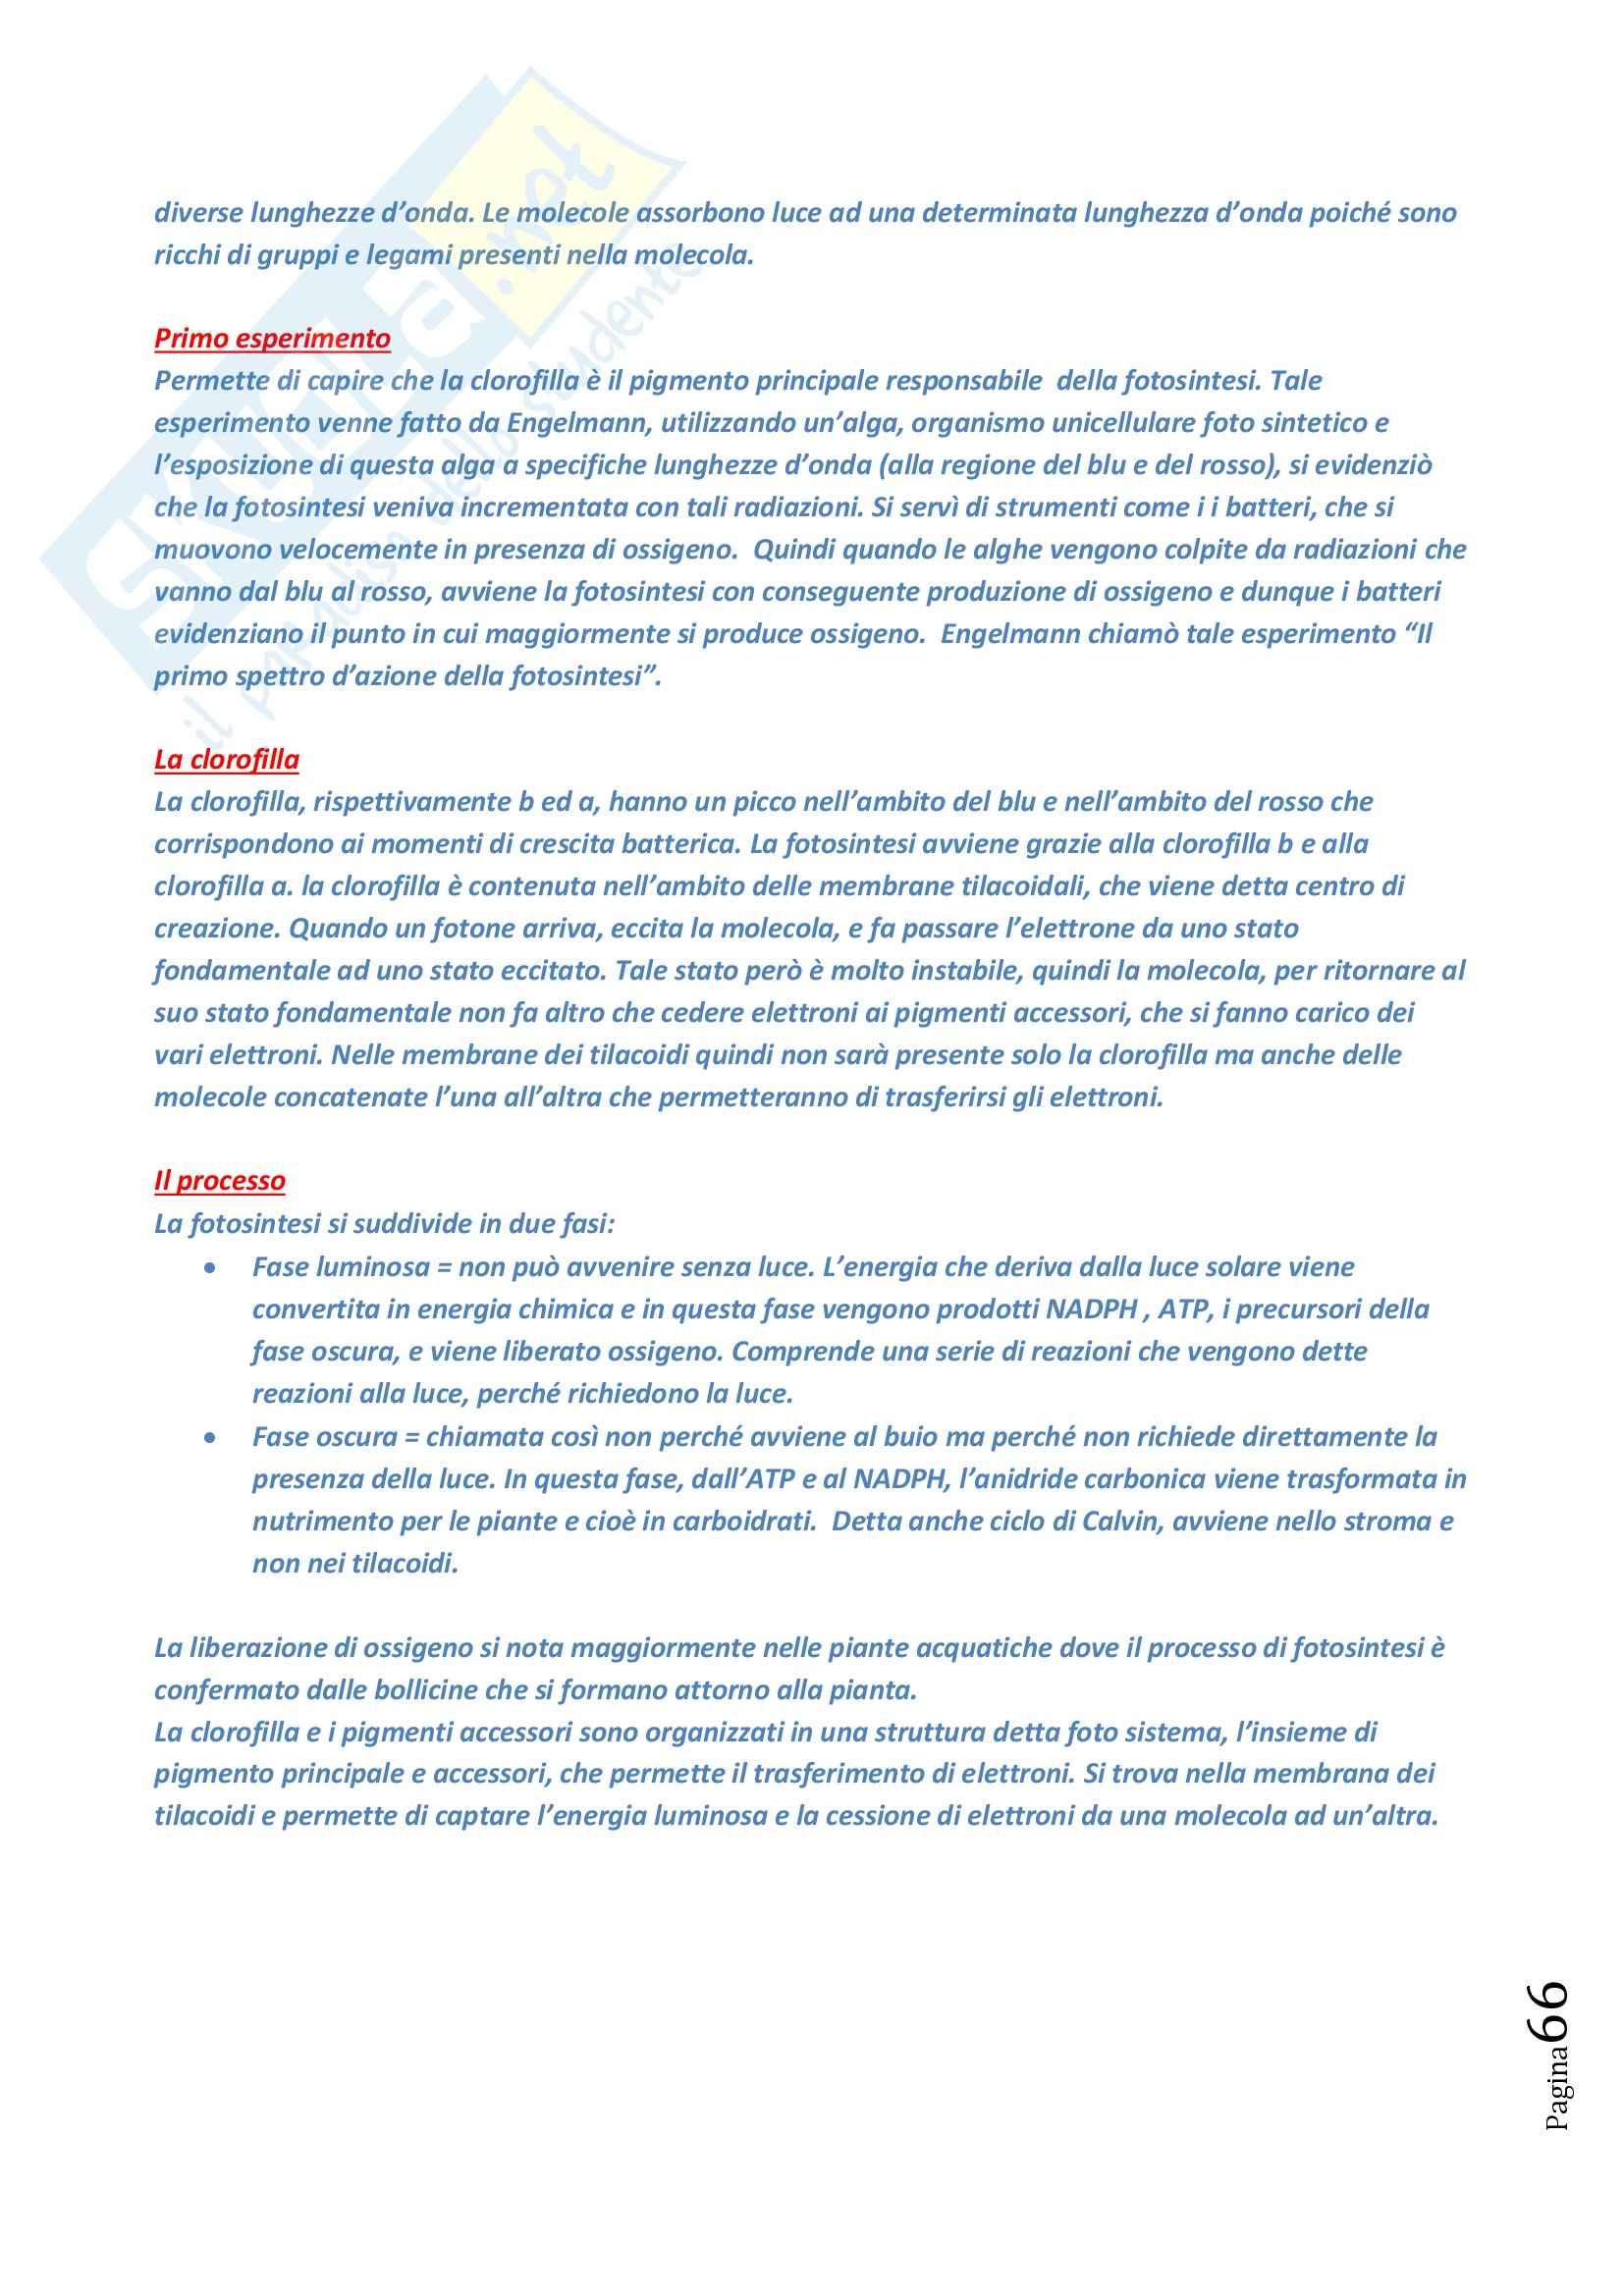 Lezioni, Biologia Animale e Vegetale Pag. 66